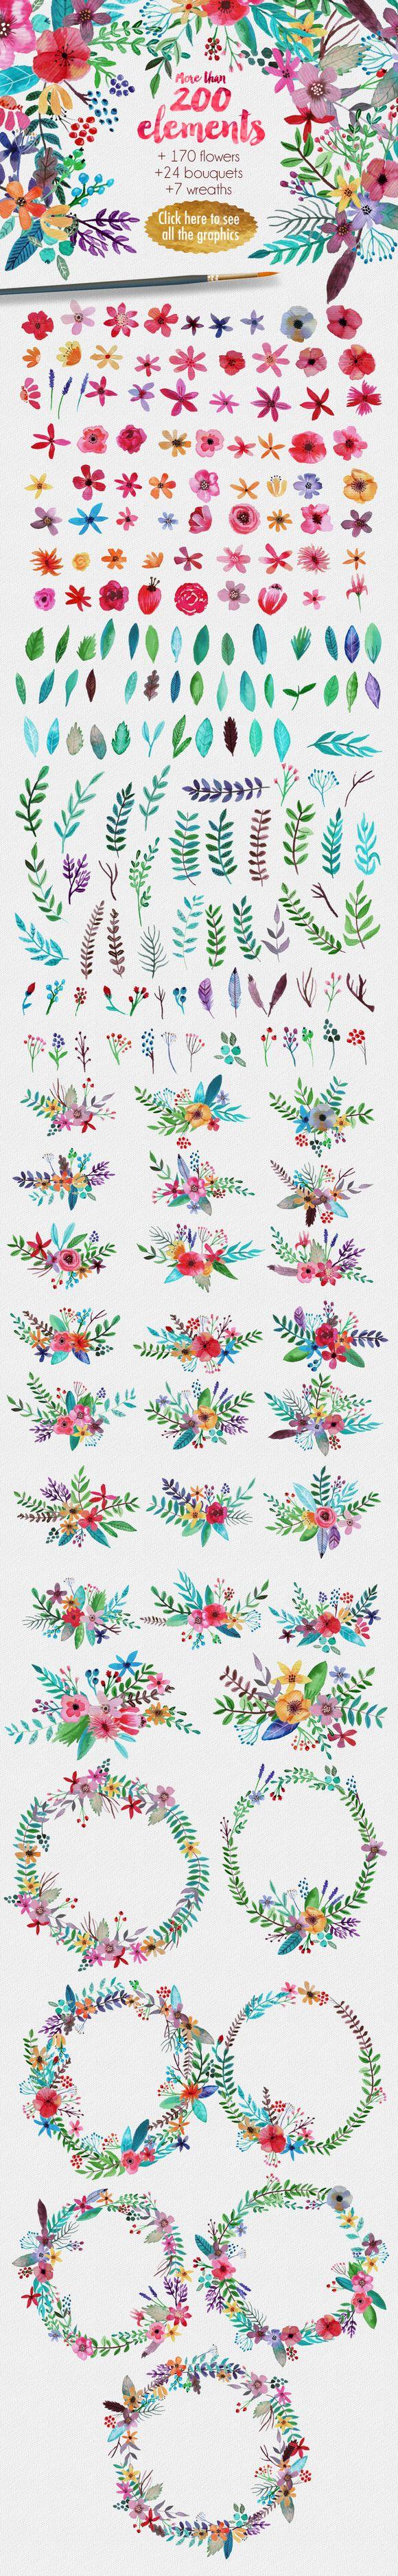 Flowertopia - Illustrations - 2